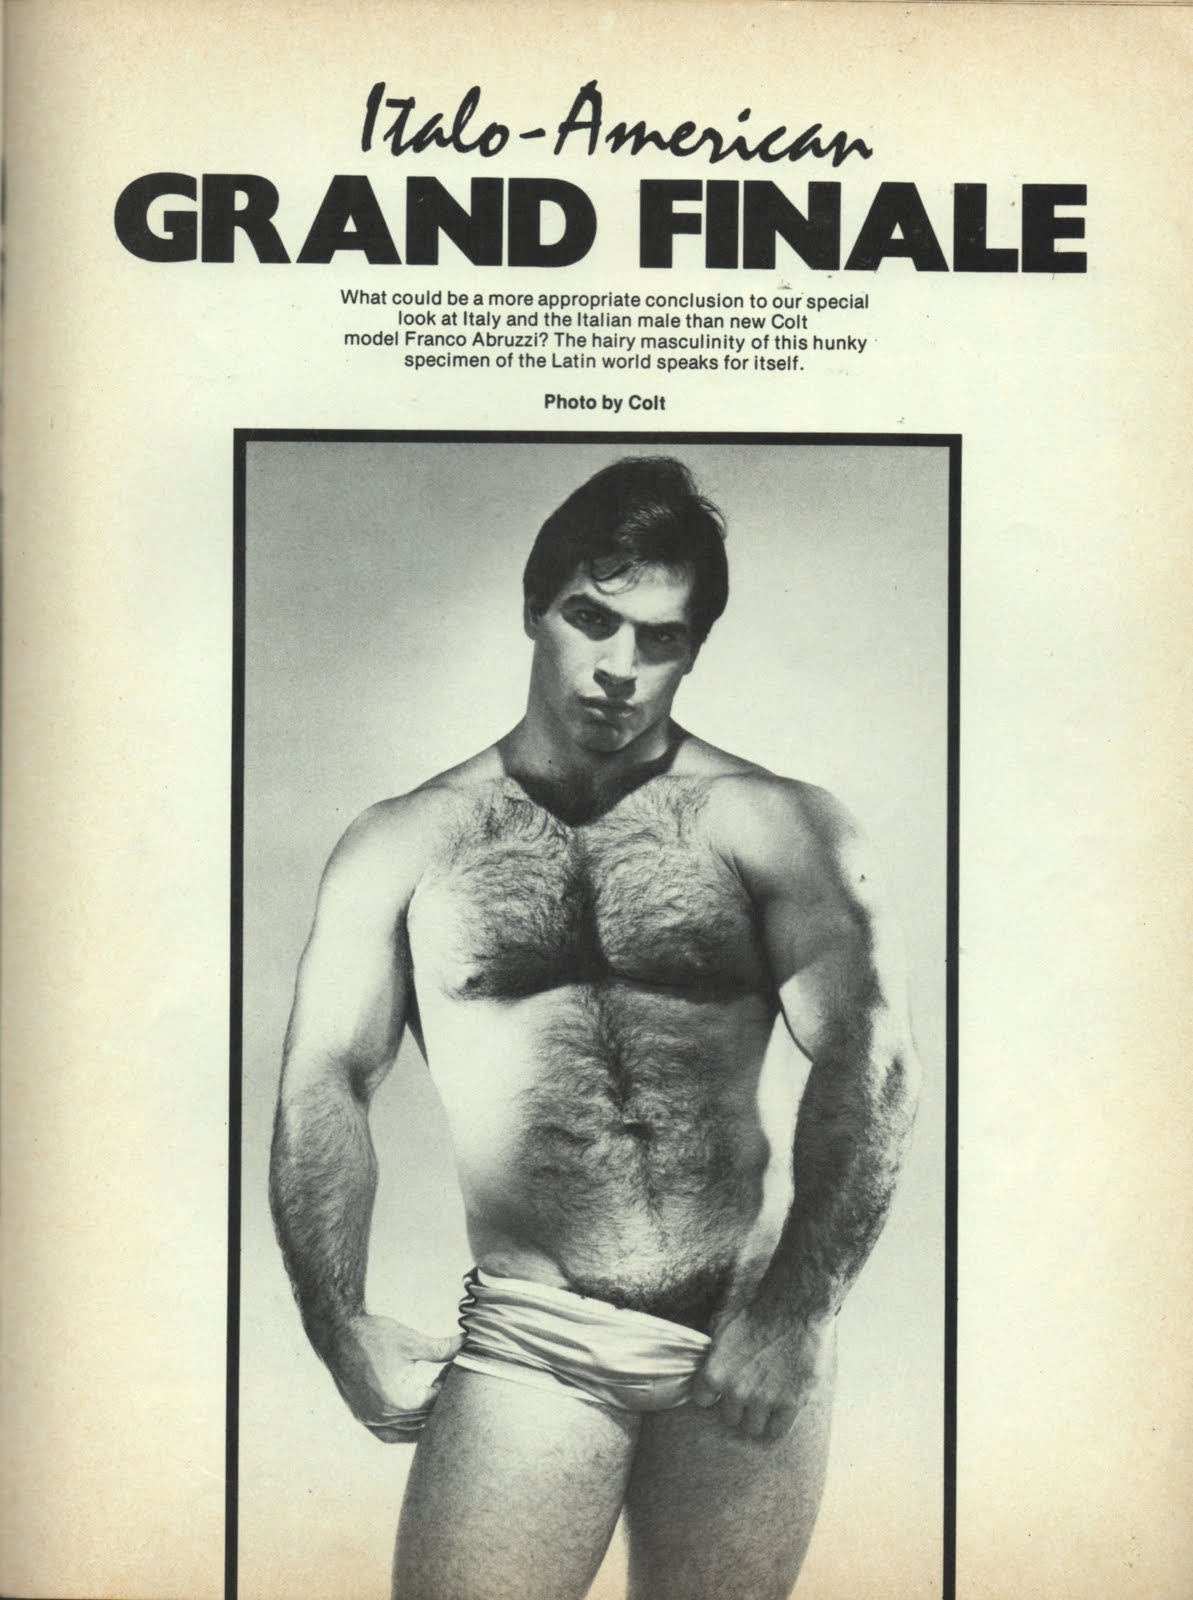 Franco Arbruzzi in Honcho - Gay Porn Obsession: gaypornobsession.typepad.com/my-blog/2010/07/franco-arbruzzi-in...